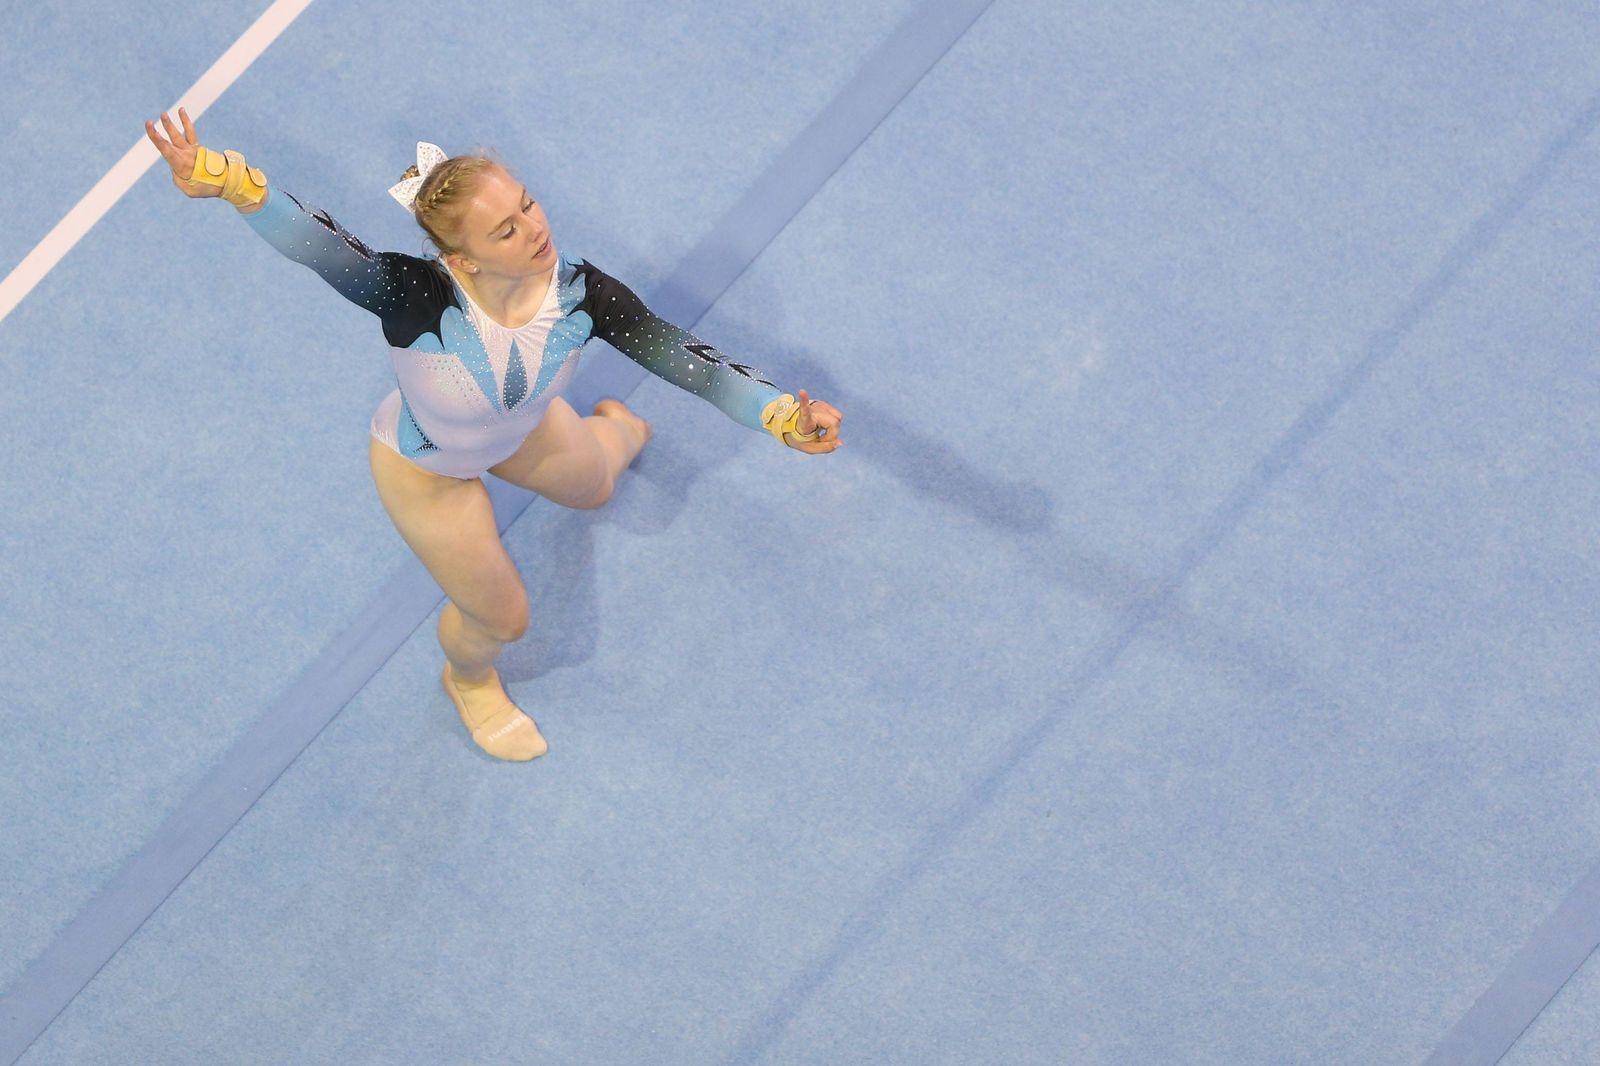 Leonie Papke Jetzendorf during all around final at 2019 National Championships in Berlin 03 08 20